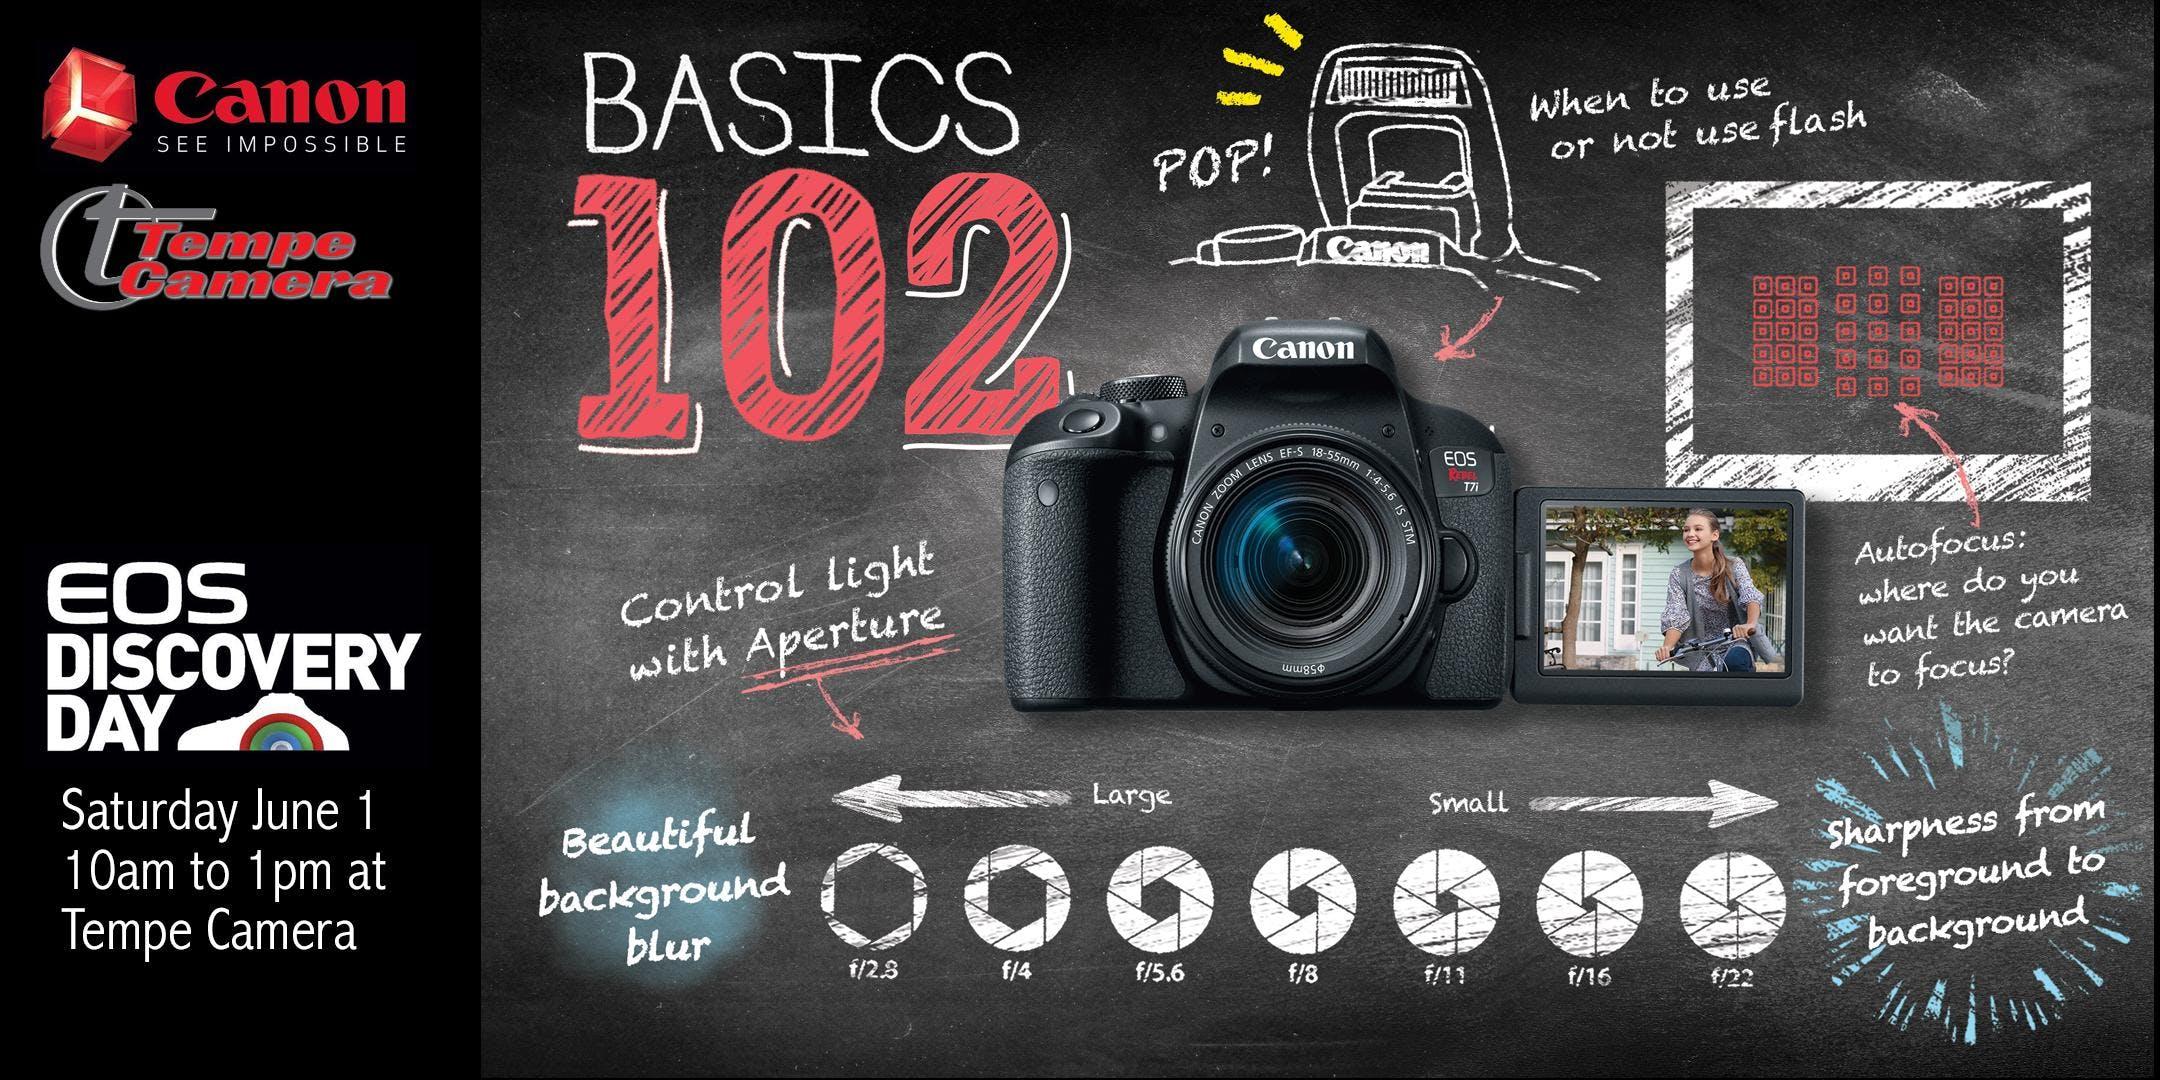 2019 Canon EOS Discovery Day: Basics 102